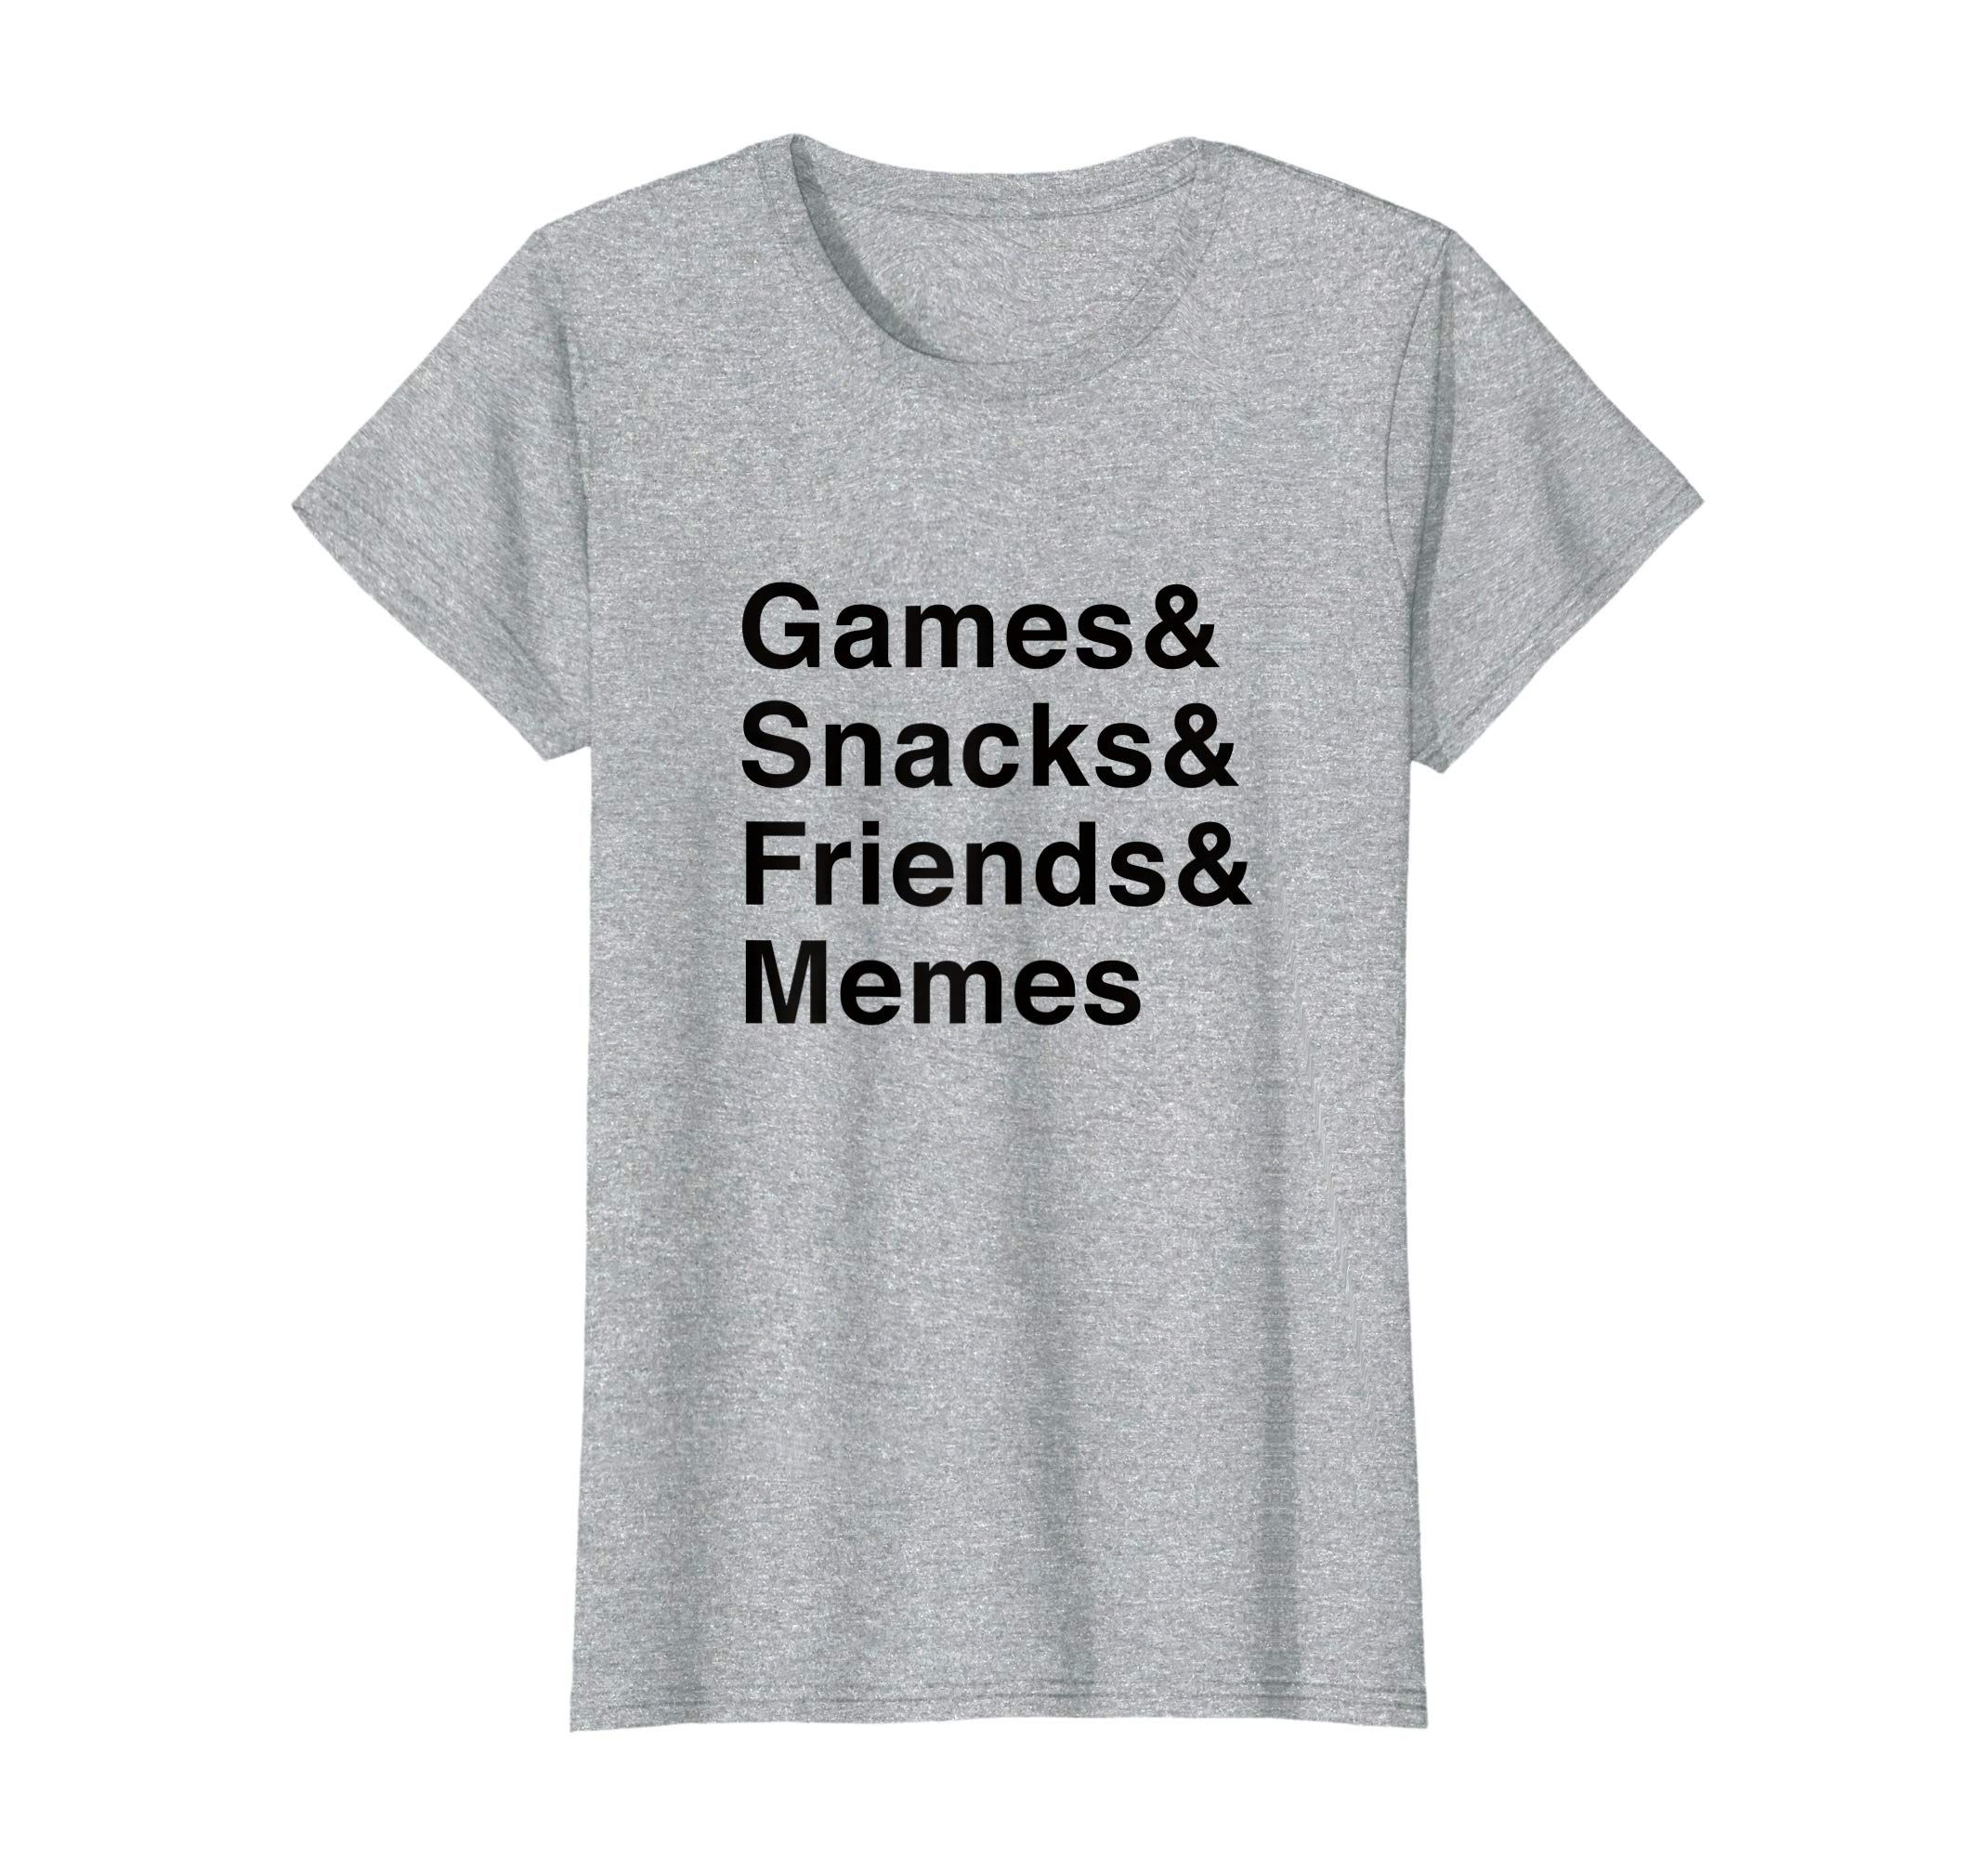 Multiplayer Games & Snacks & Friends & Memes T